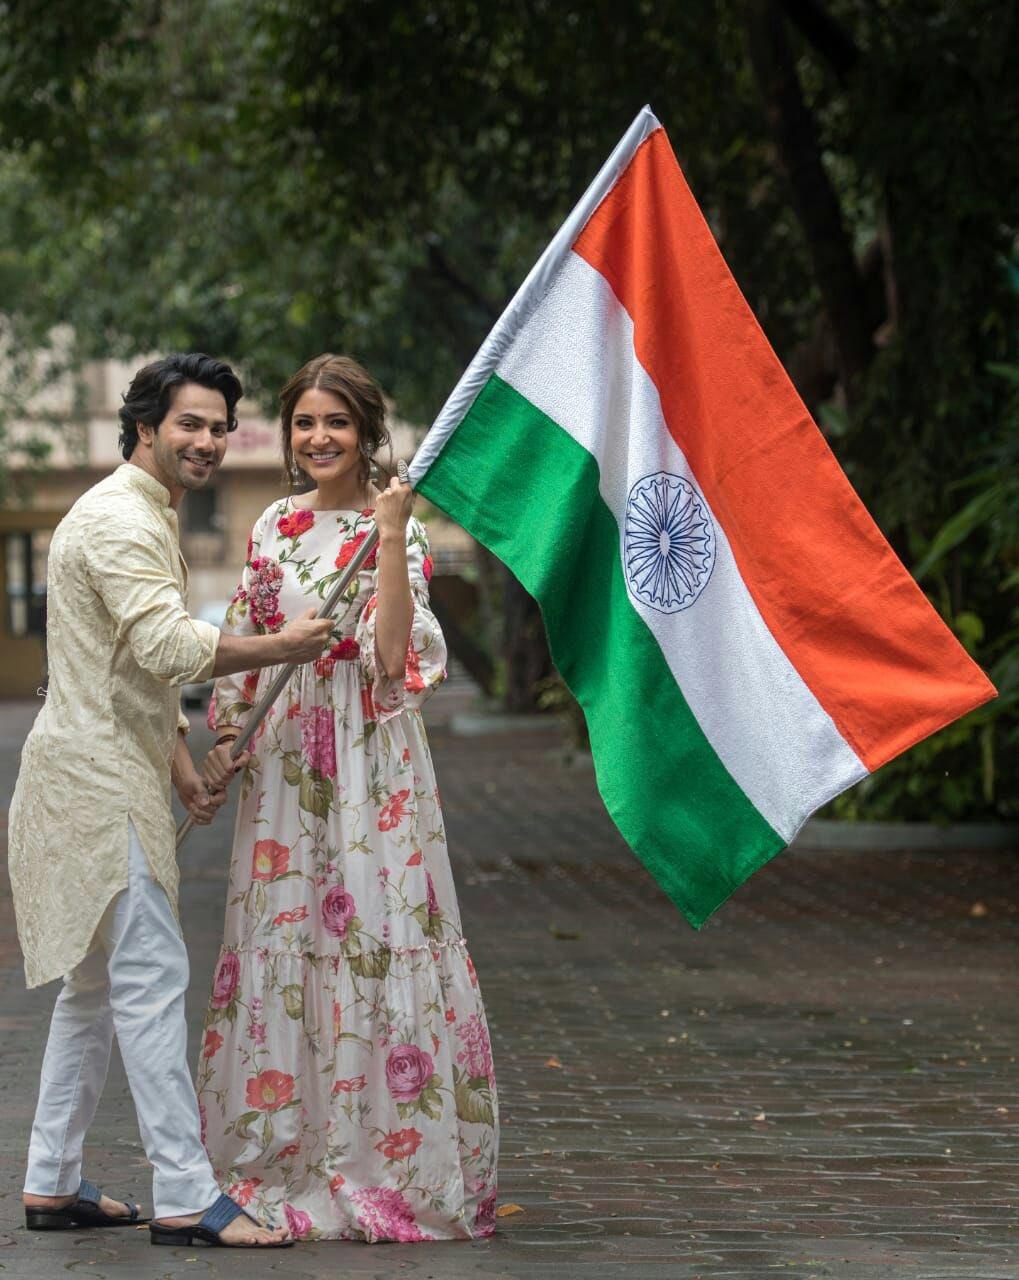 Happy Independence Day ������ @Varun_dvn @yrf @suiDhaagafilm   �� - @htTweets https://t.co/5bQ3vb8cKk